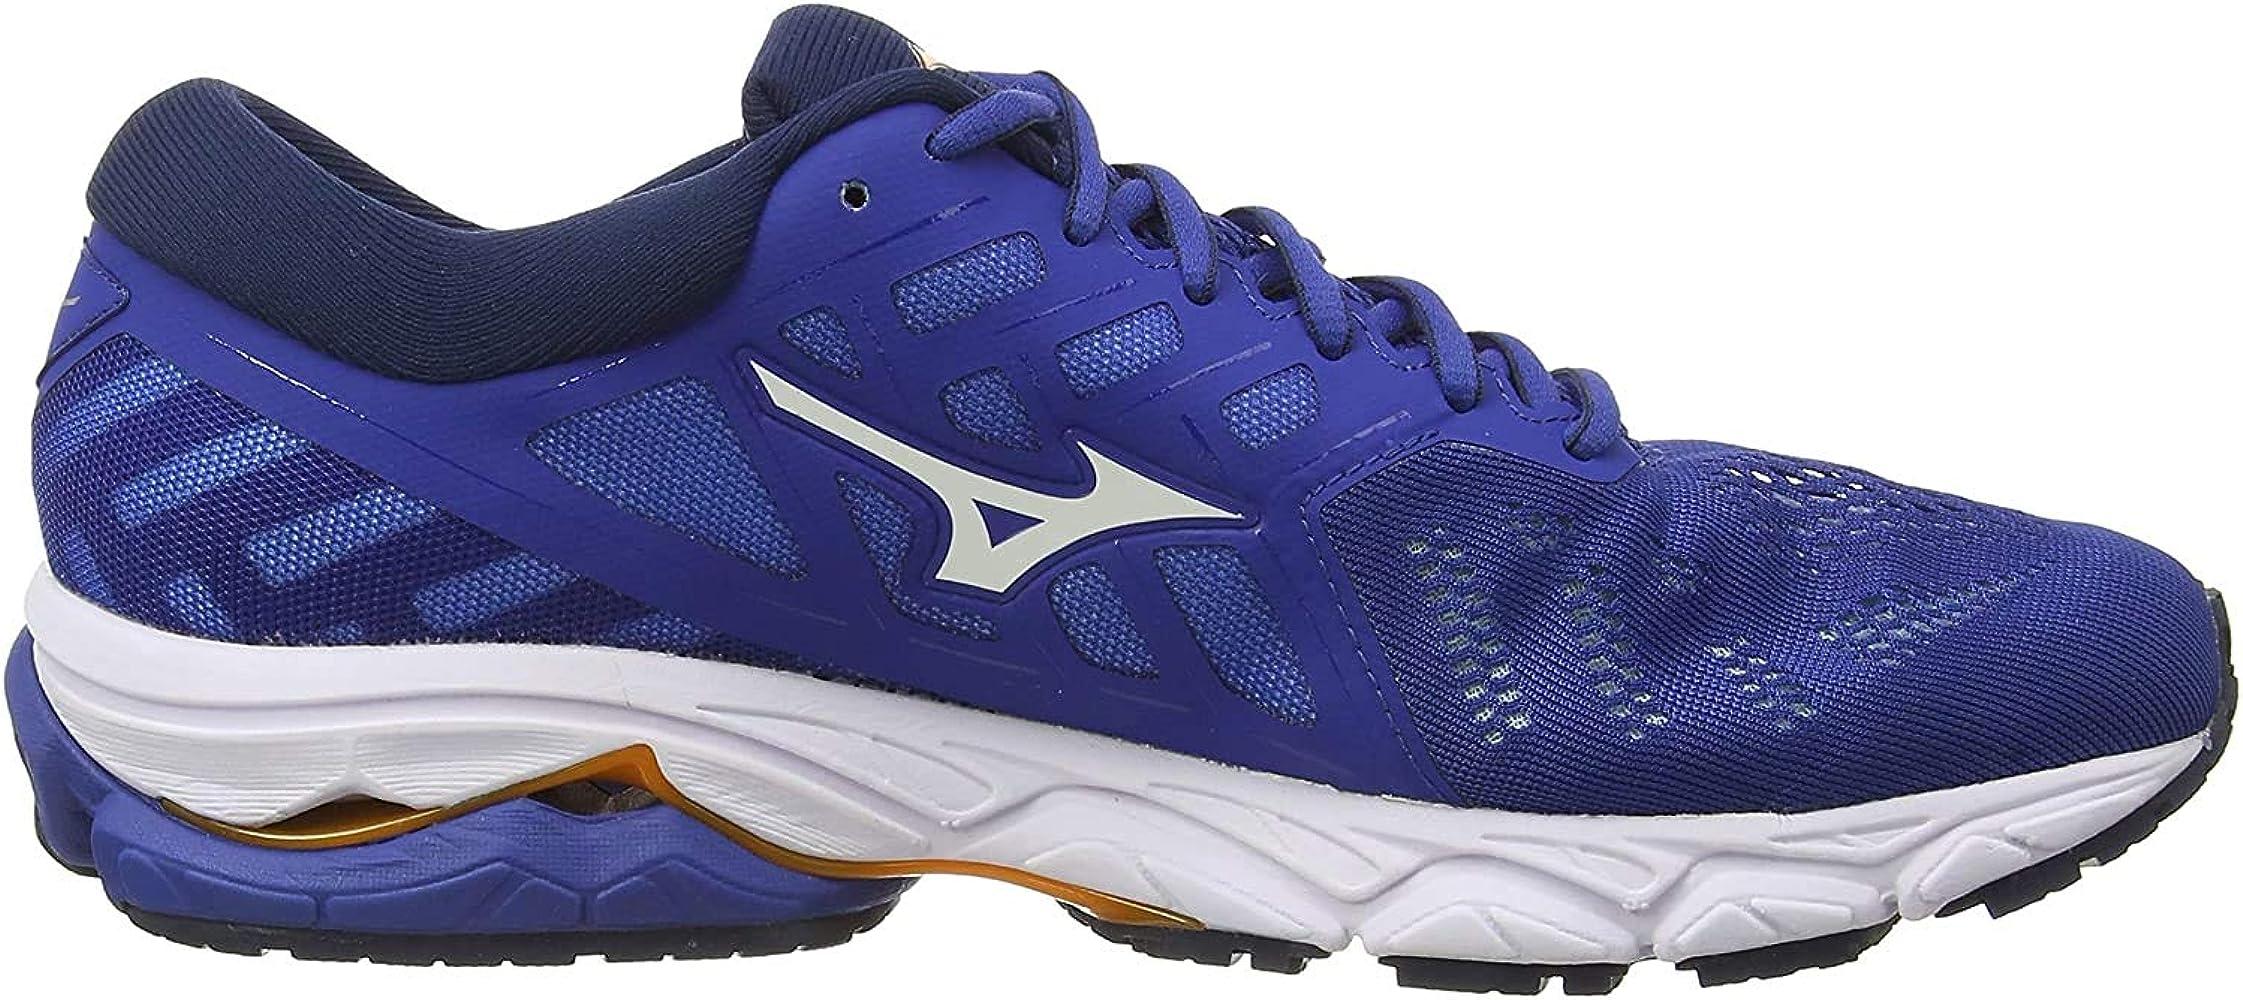 Mizuno Wave Ultima 11, Zapatillas de Running para Hombre, Azul ...